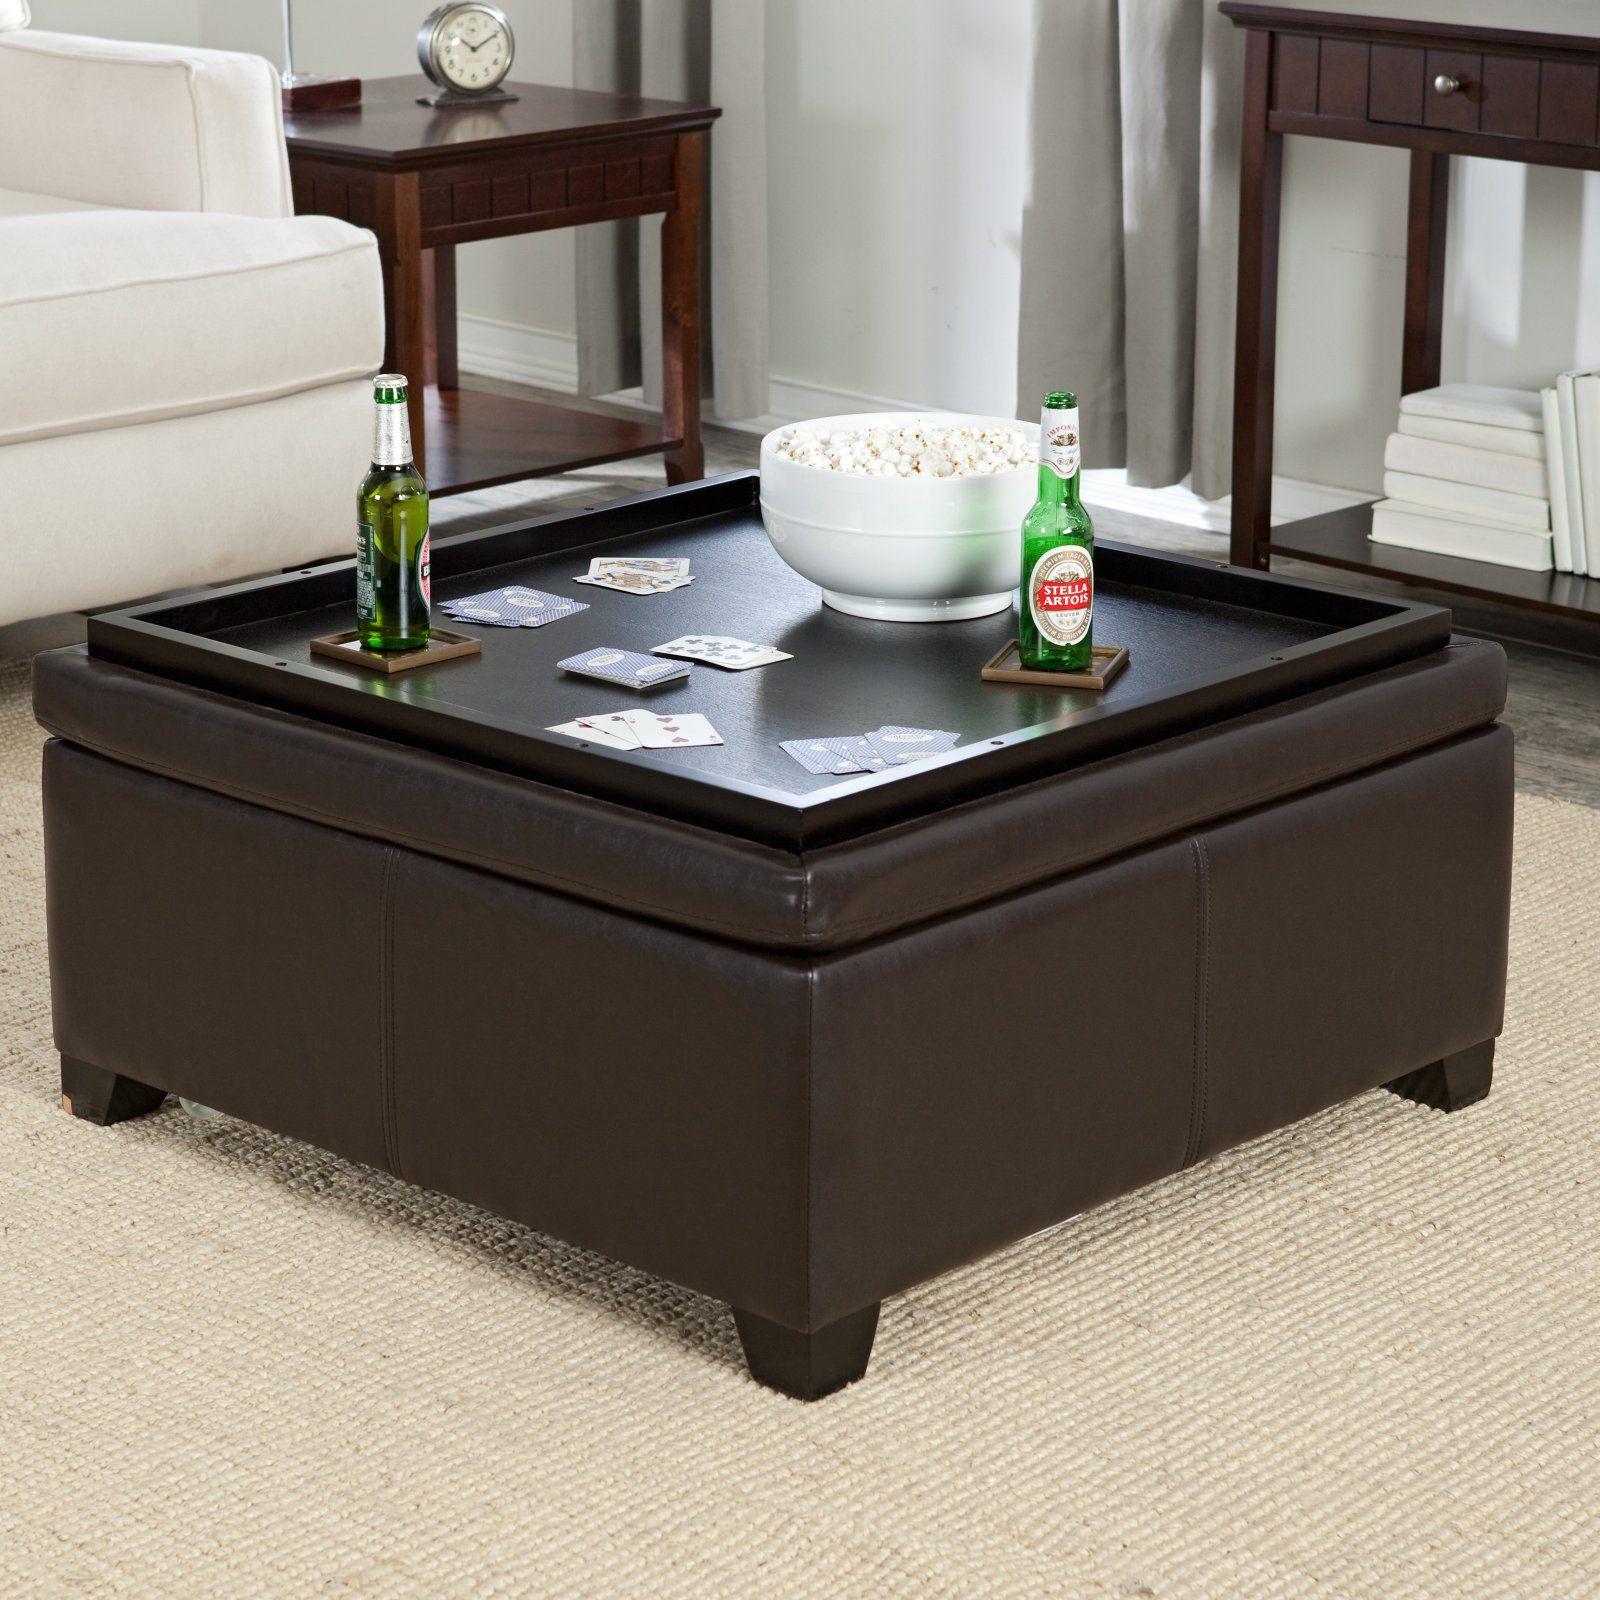 corbett coffee table storage ottoman